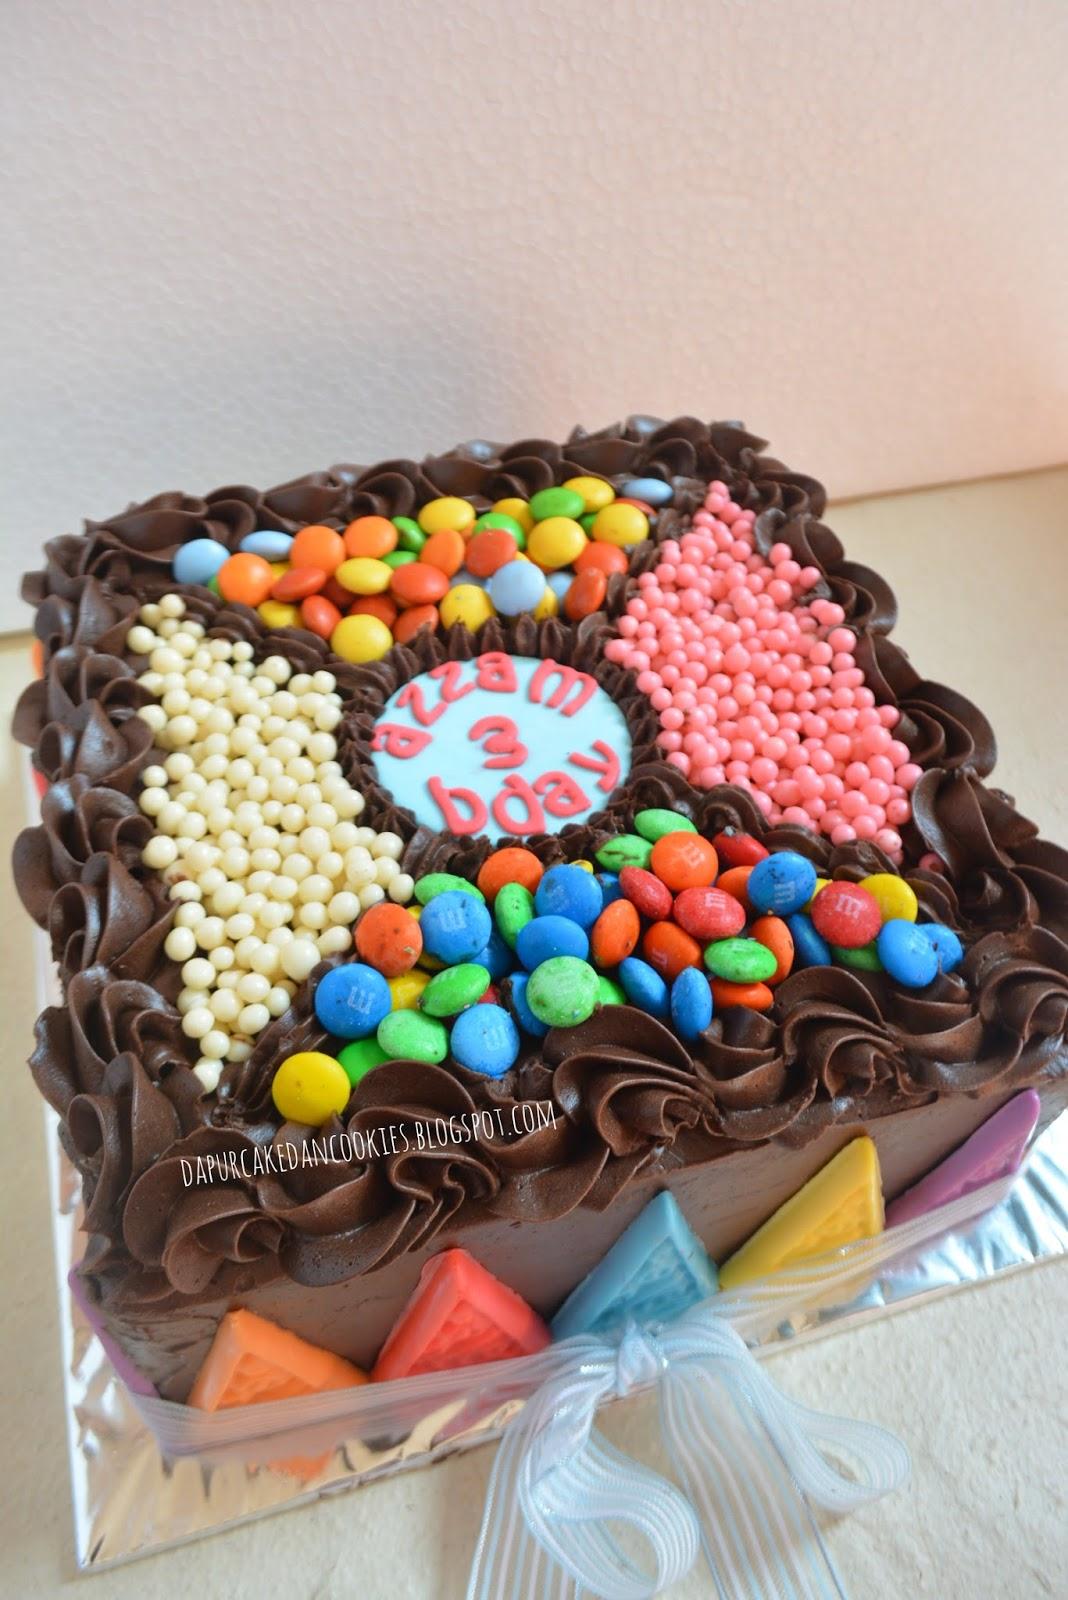 DAPUR CAKE DAN COOKIES COLORFULL CHOCOLATE BIRTHDAY CAKE FOR AZZAM